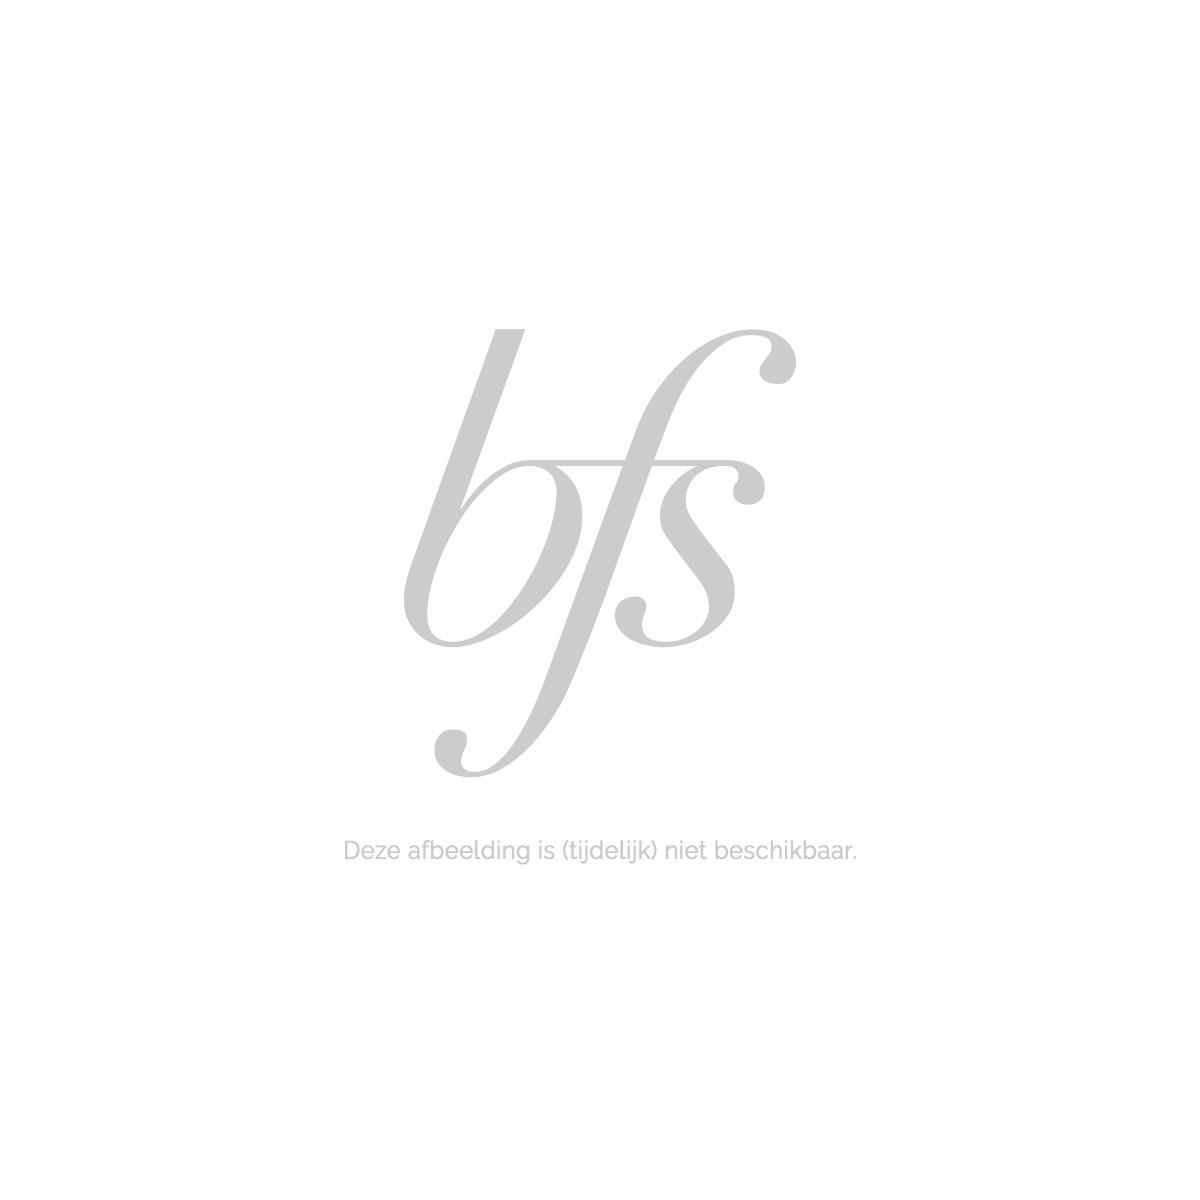 Bourjois Dissolvant Miraculeux 1 Seconde 2 In 1 Dissolvant-Miraculeux 1 S